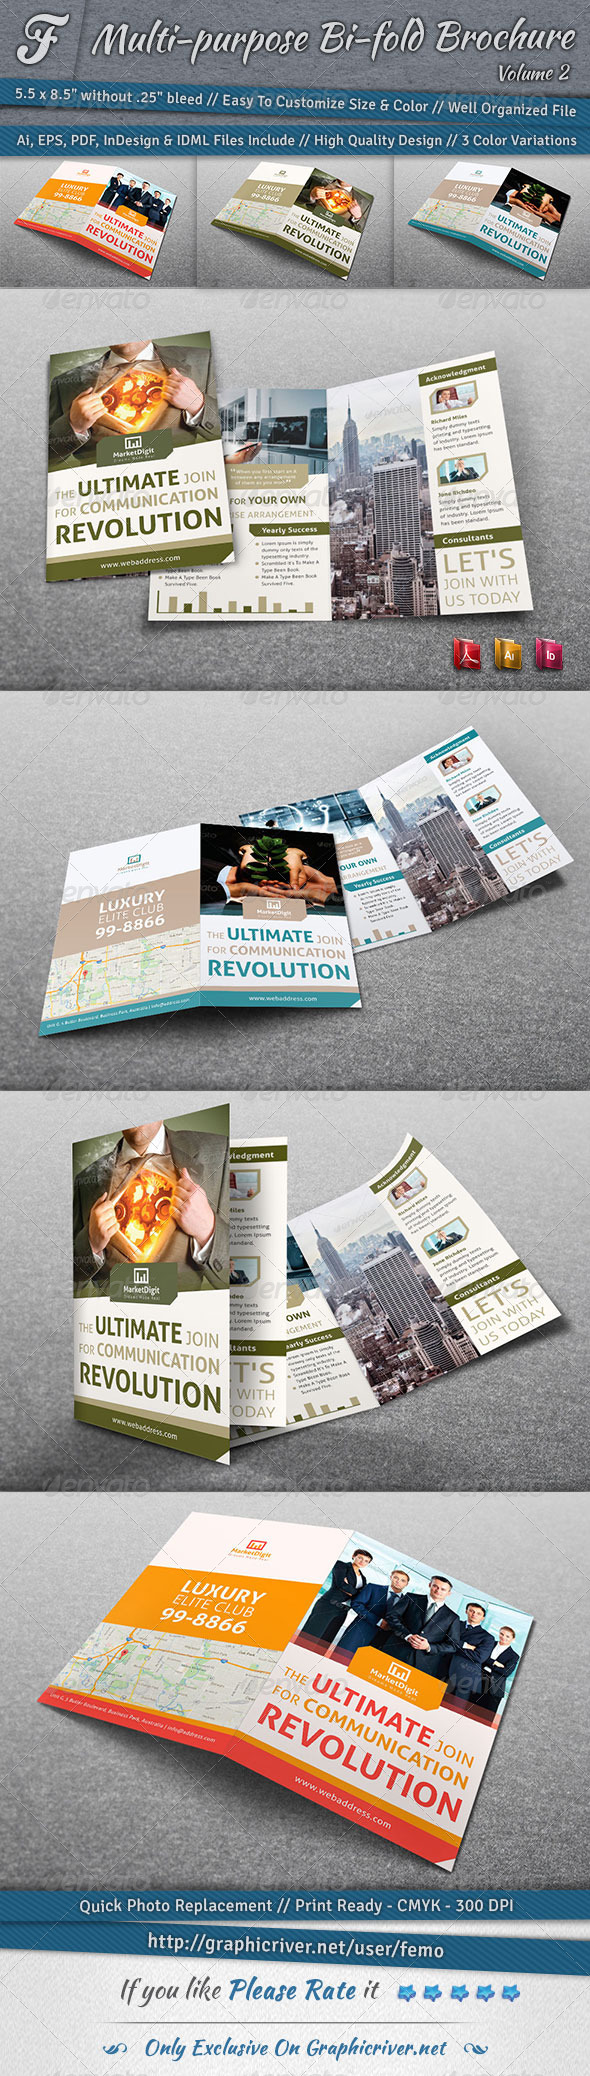 Multi-purpose Bi-fold Brochure   Volume 2 - Corporate Brochures